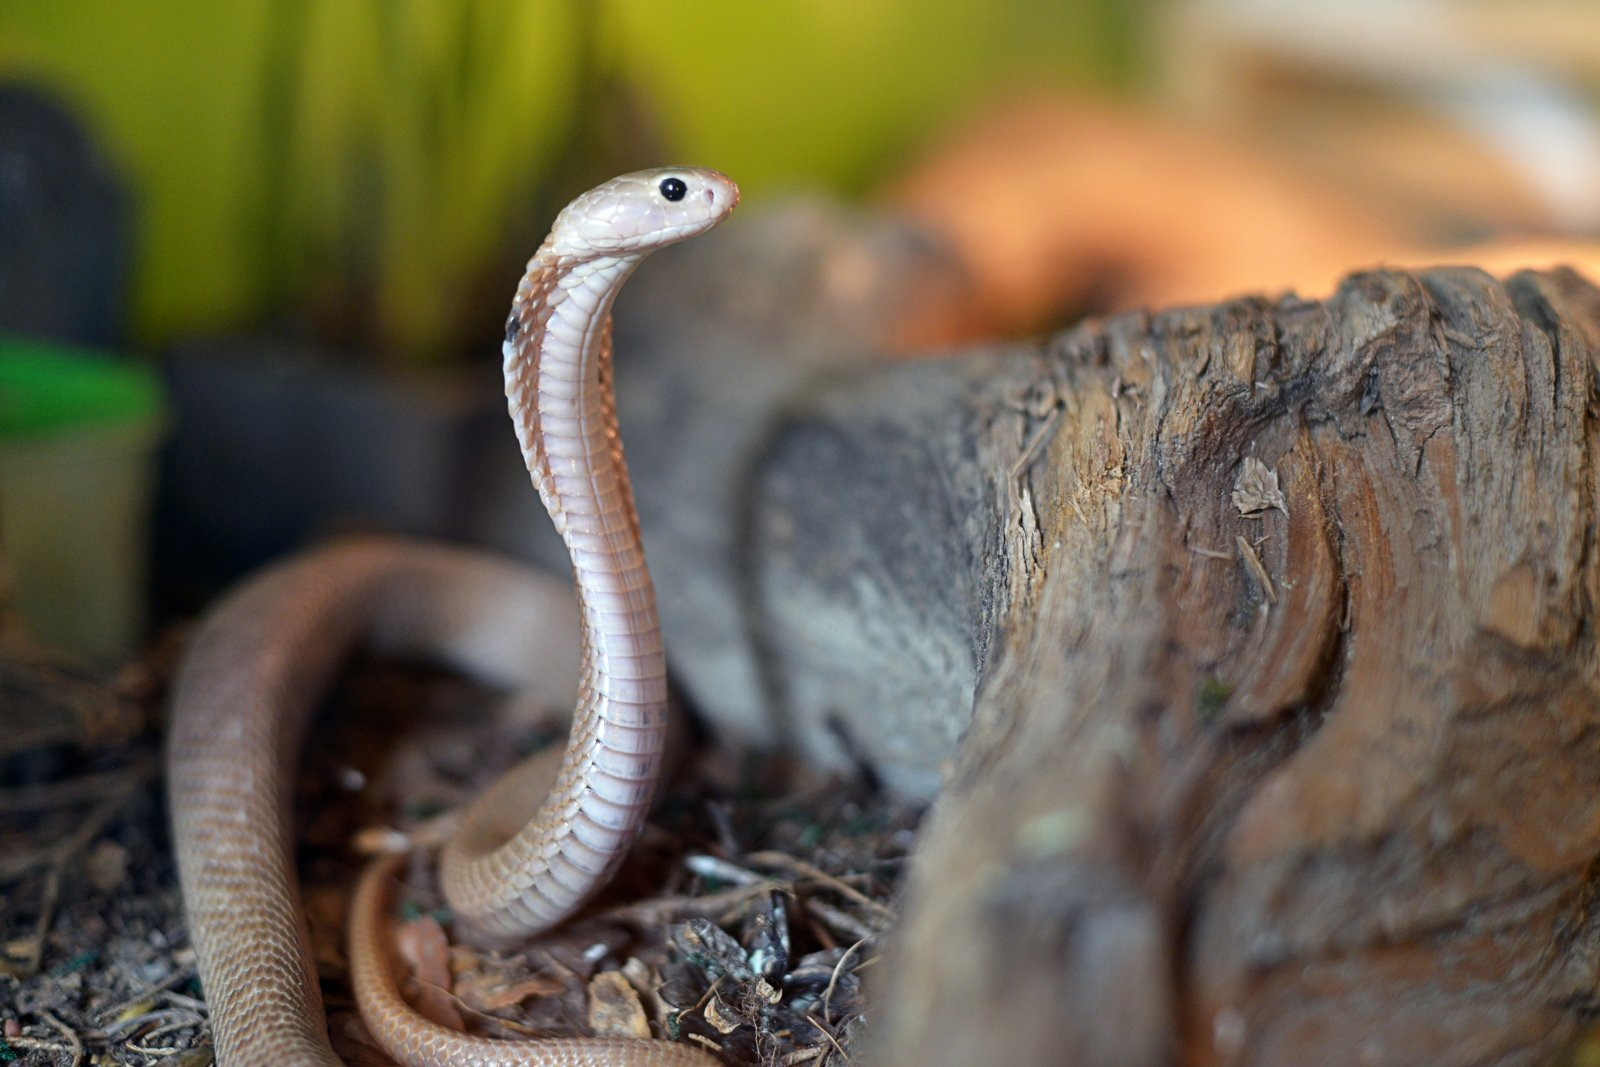 Cobra by Mitja Derenda